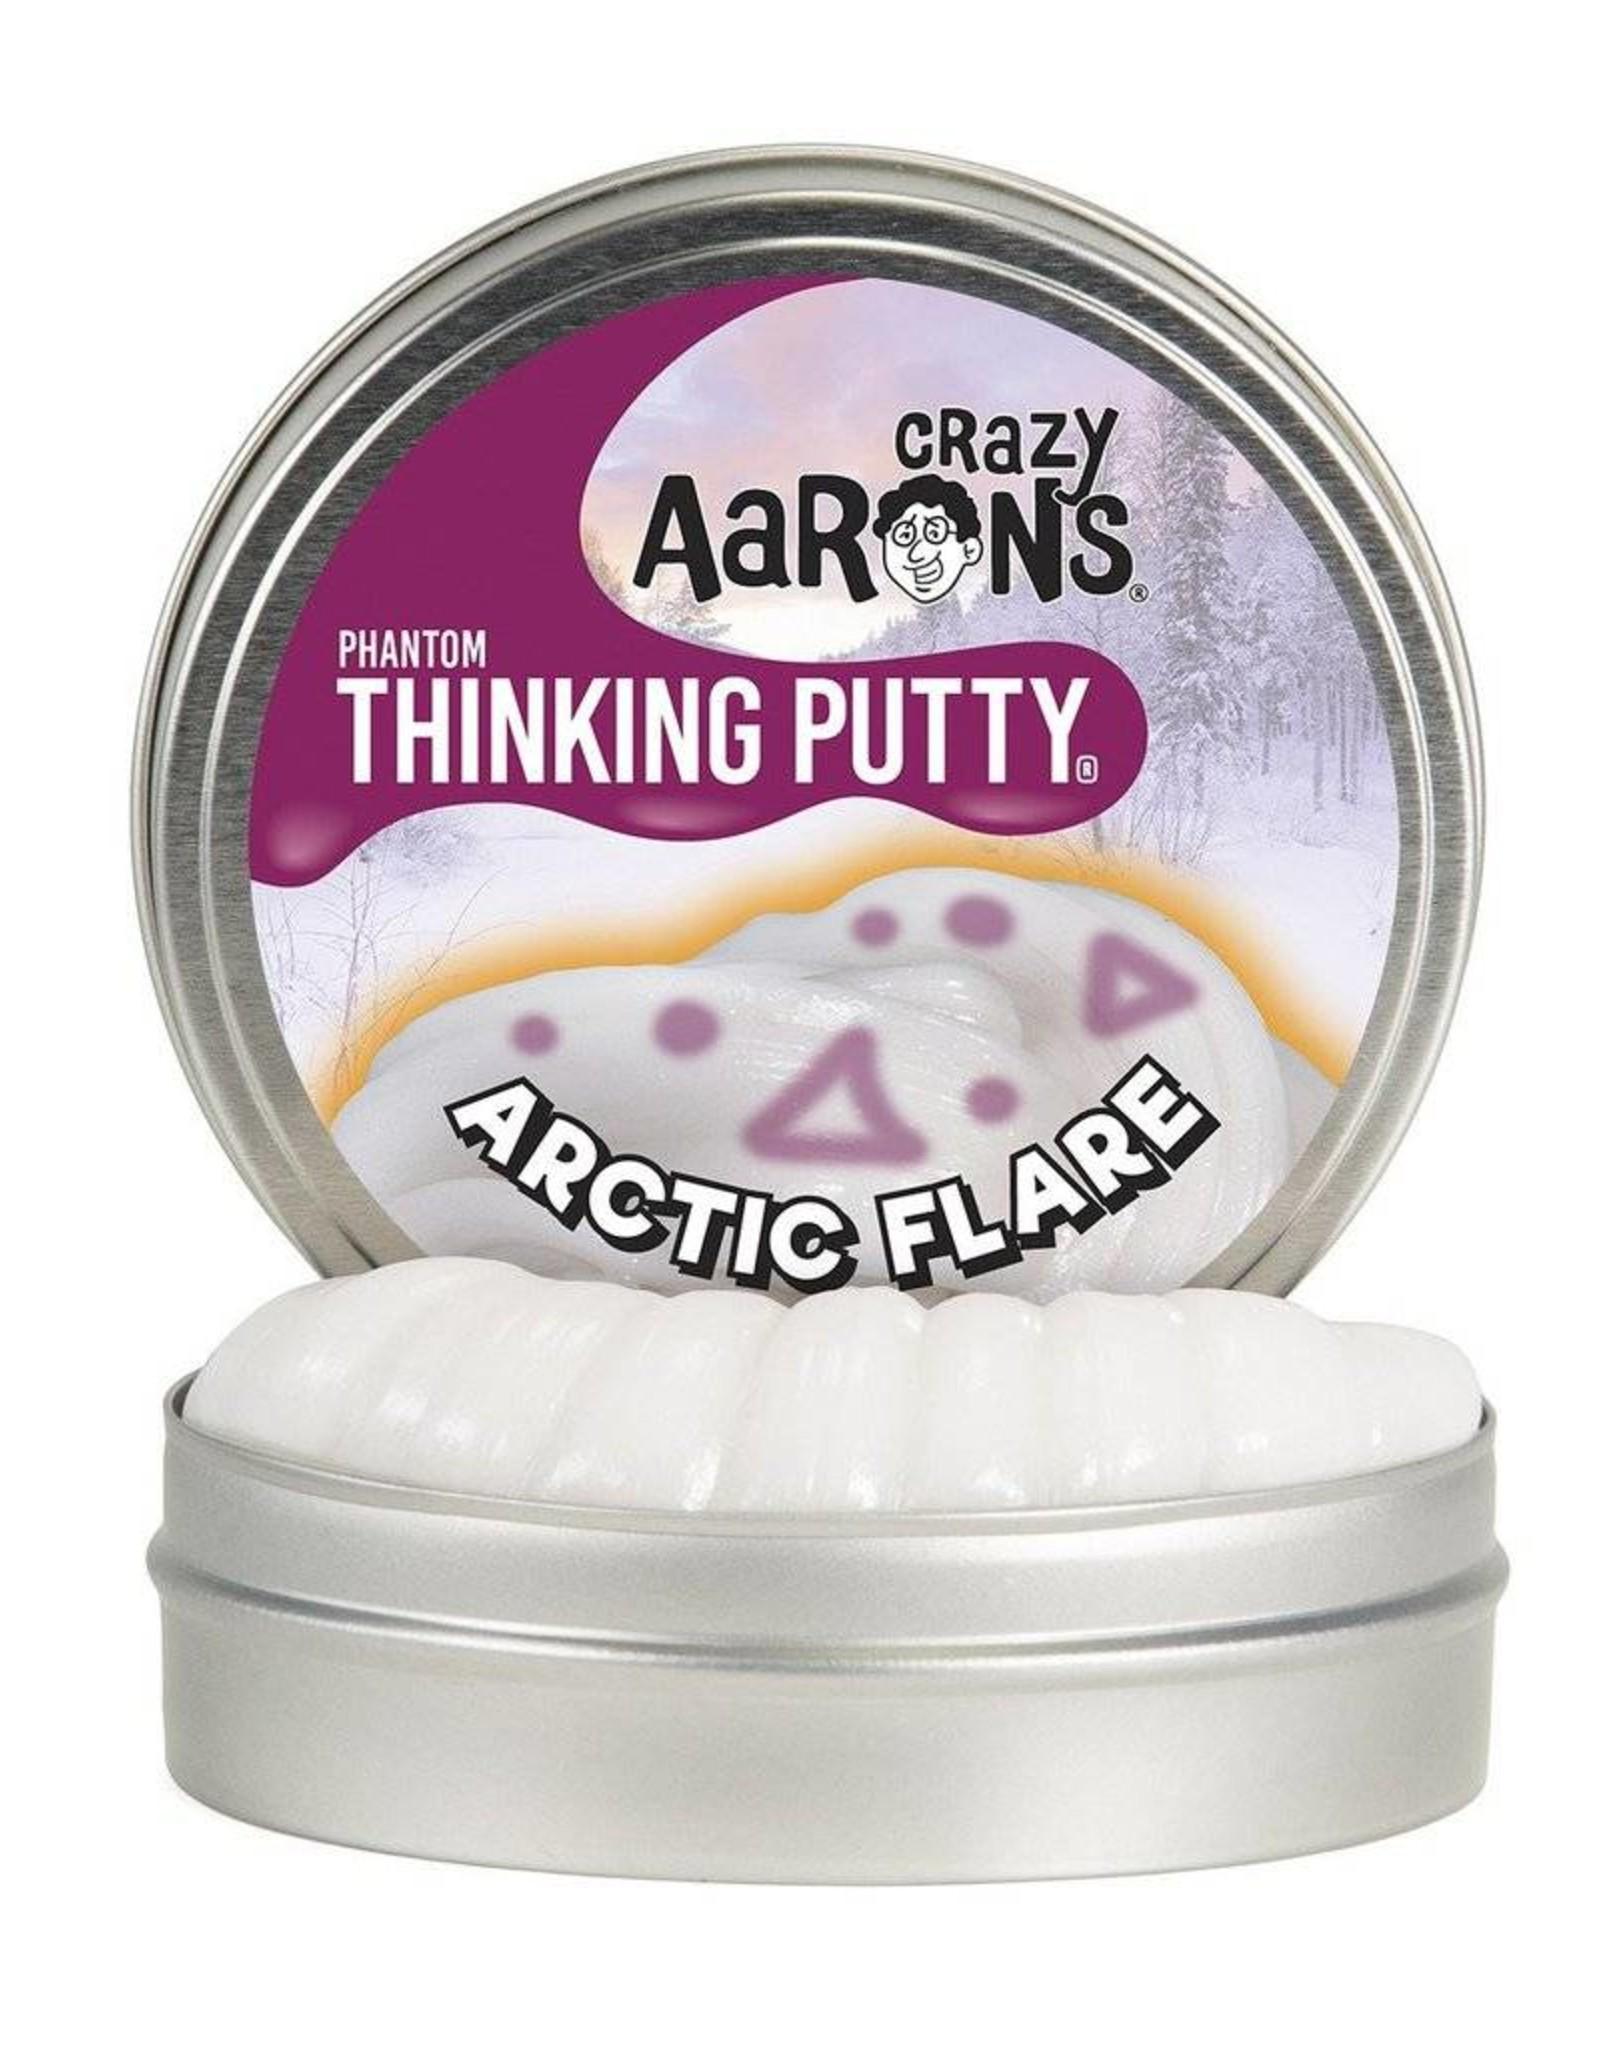 "Crazy Aaron's Putty Arctic Flare 4"" Tin"